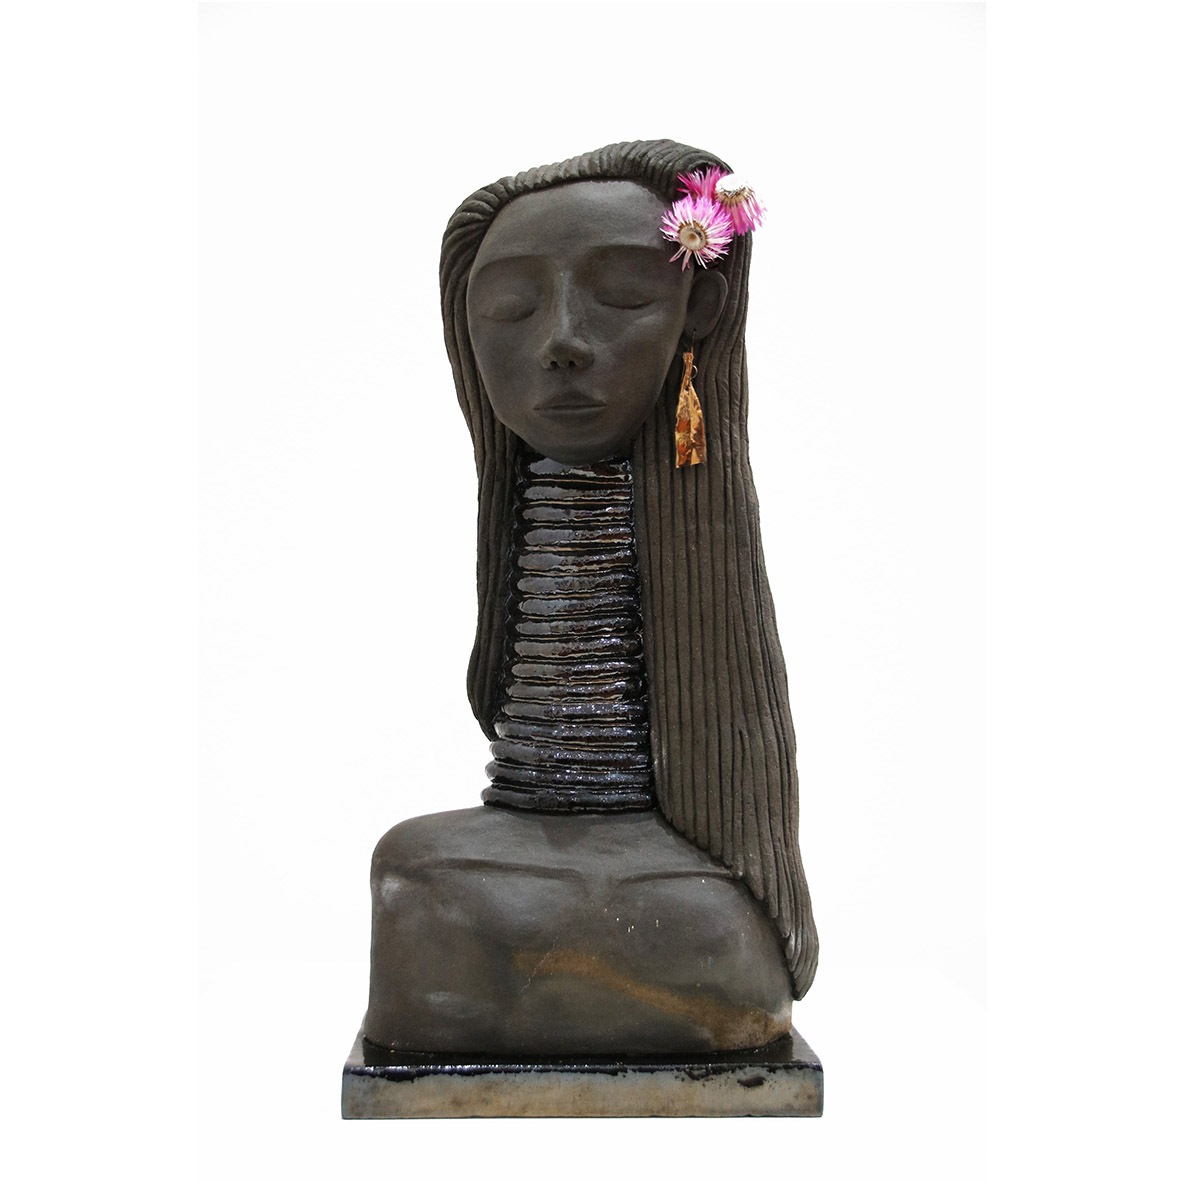 Nava Derakhchani Sheba 2019 Mixed media ceramic sculpture 22.5 x 10.5 x 44 cm